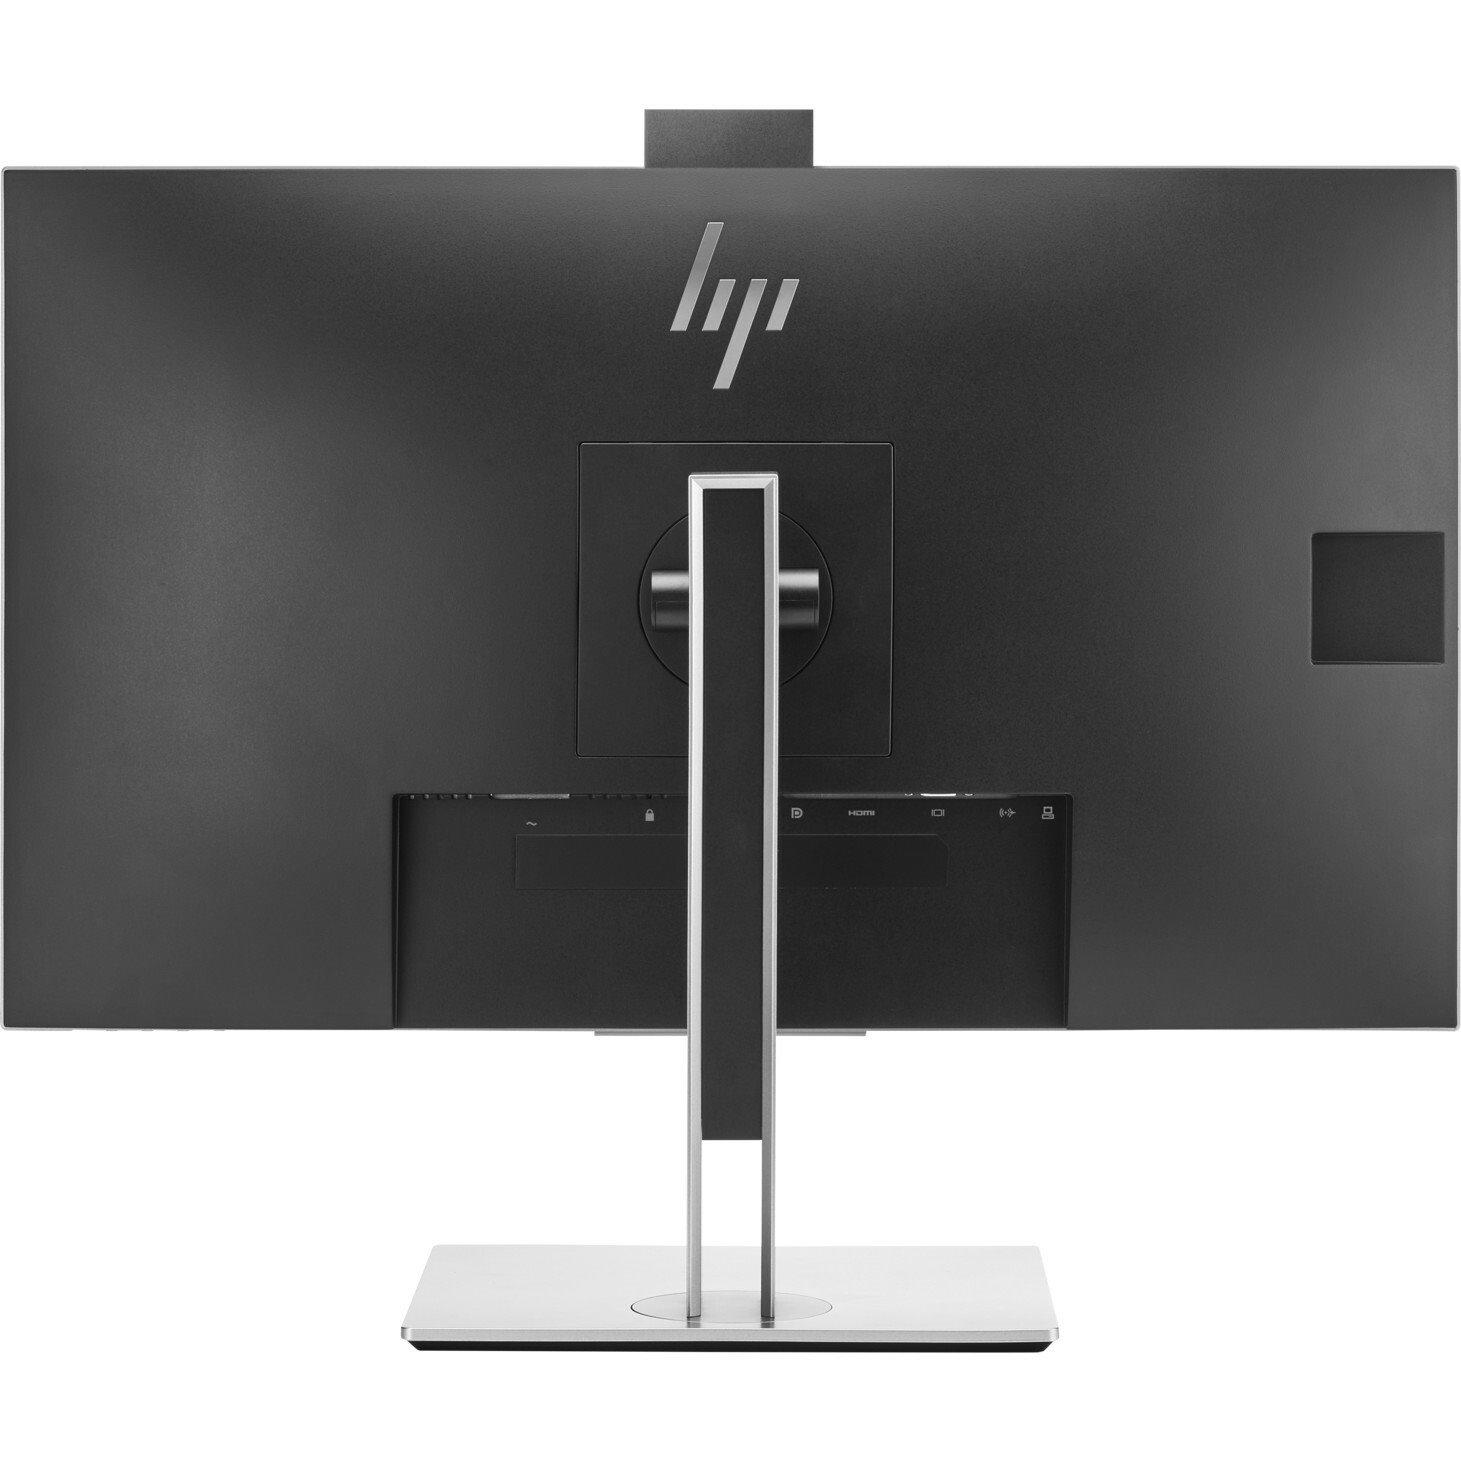 "HP Business E273m 68.6 cm (27"") Full HD LED LCD Monitor - 16:9 - Black, Silver"